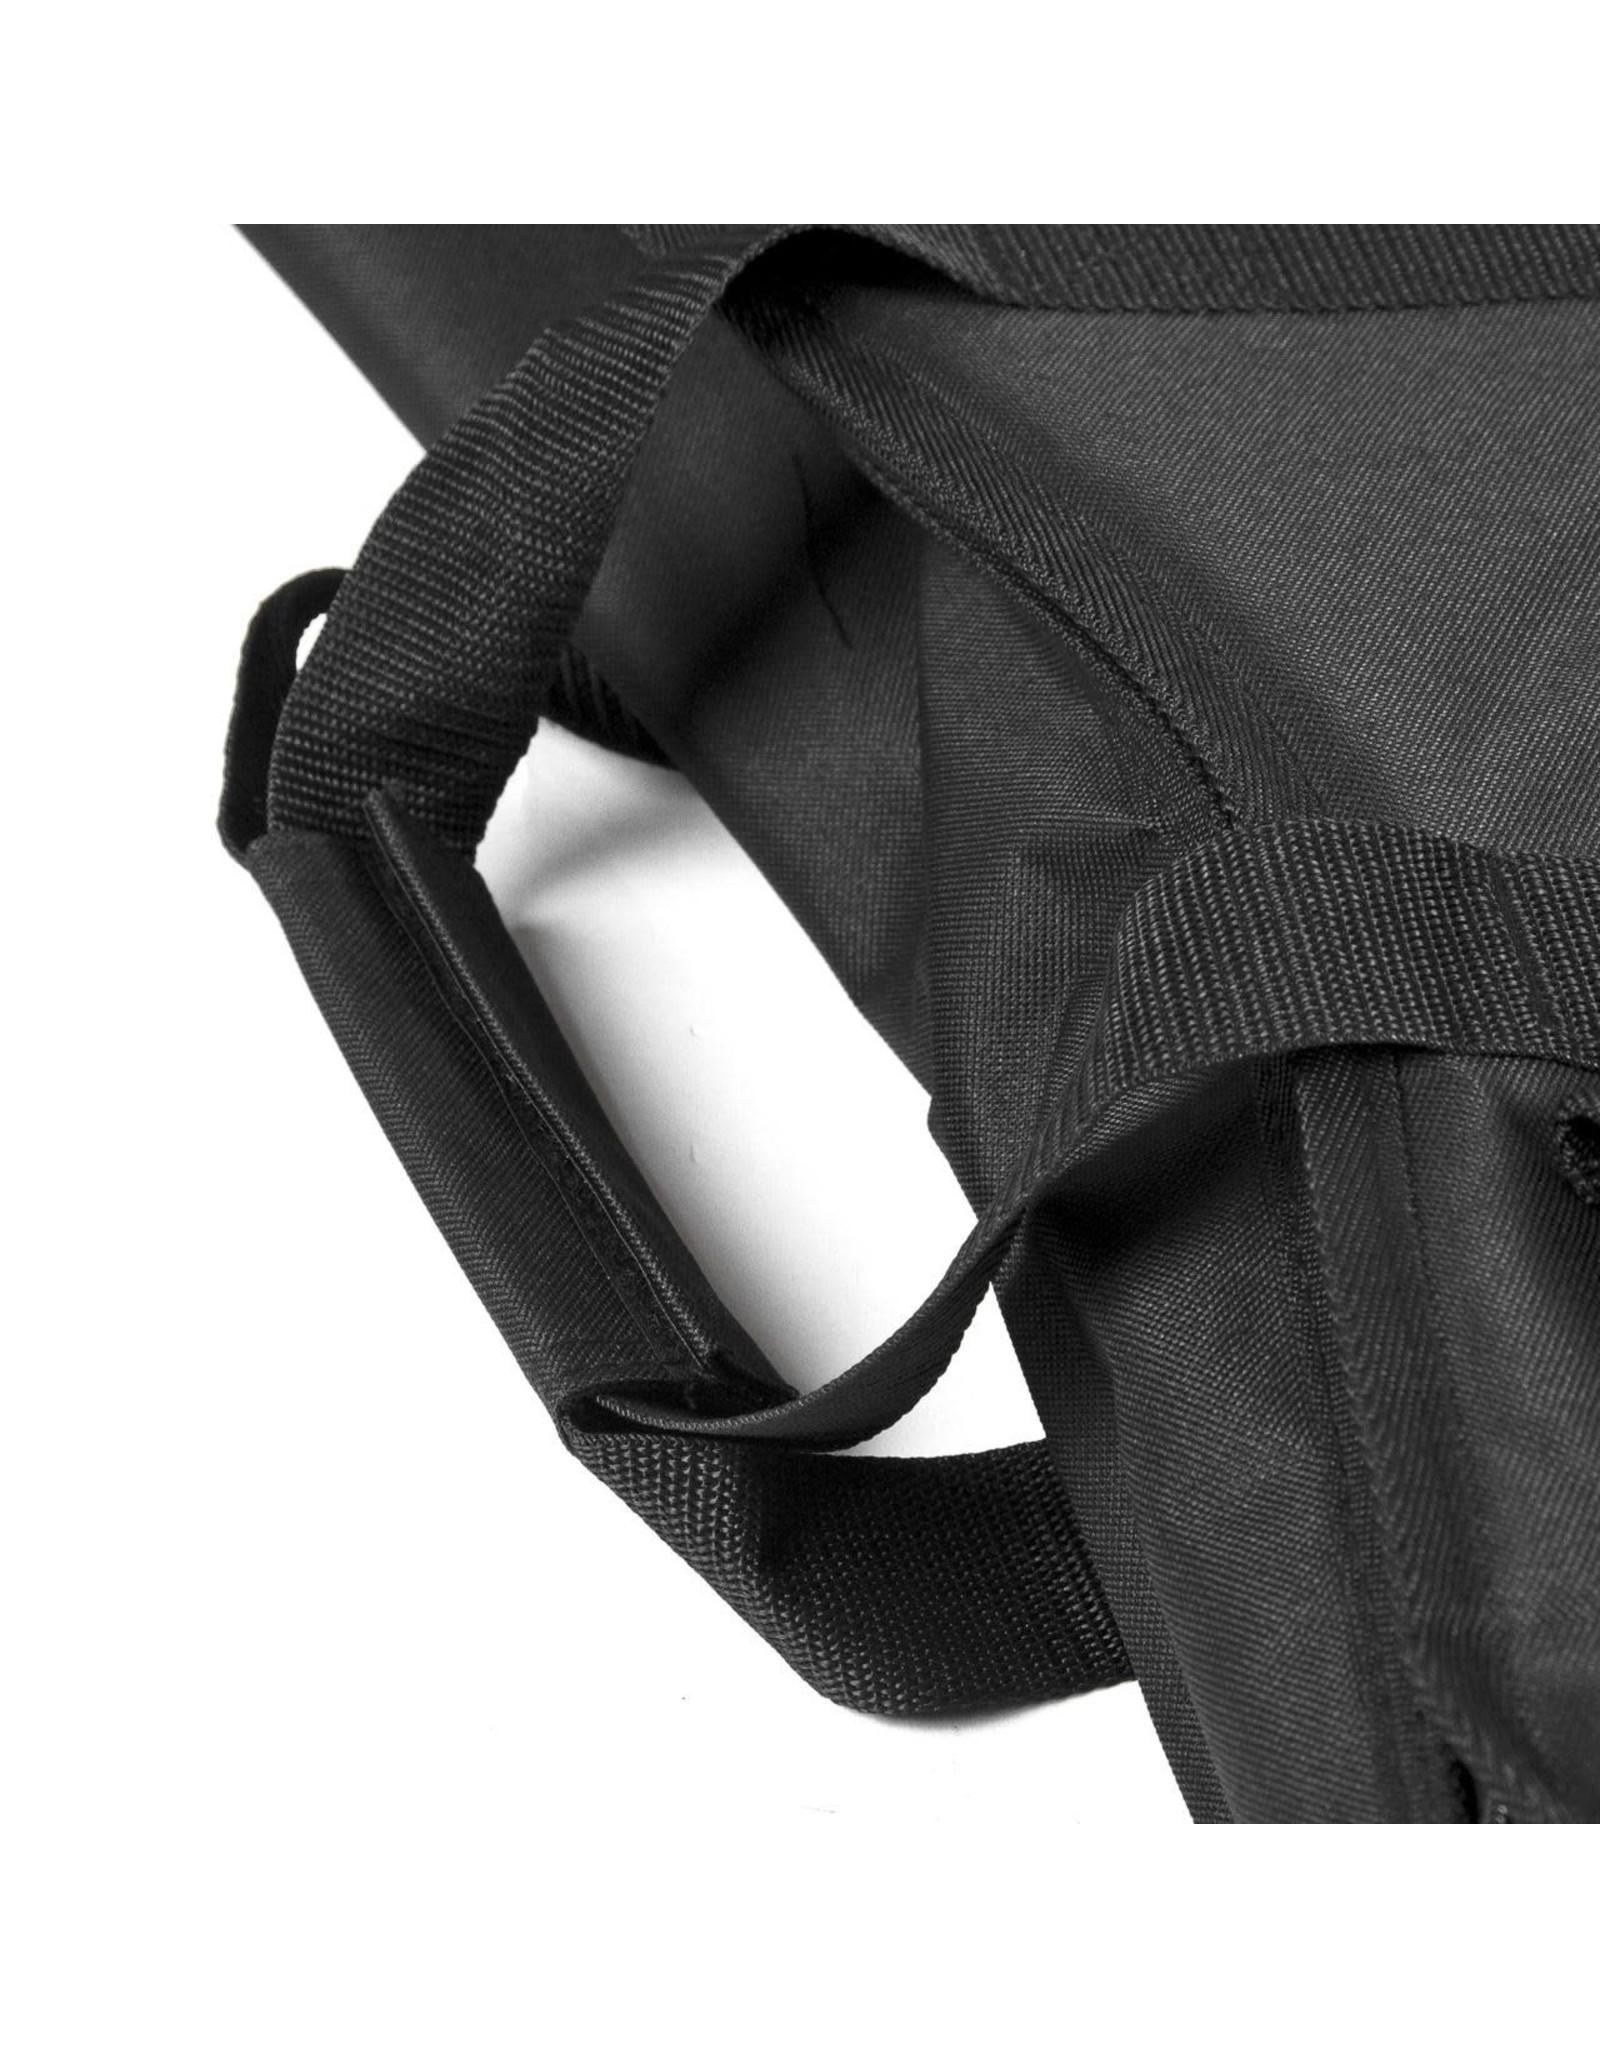 Guardian Guardian CG-100-J Banjo Bag